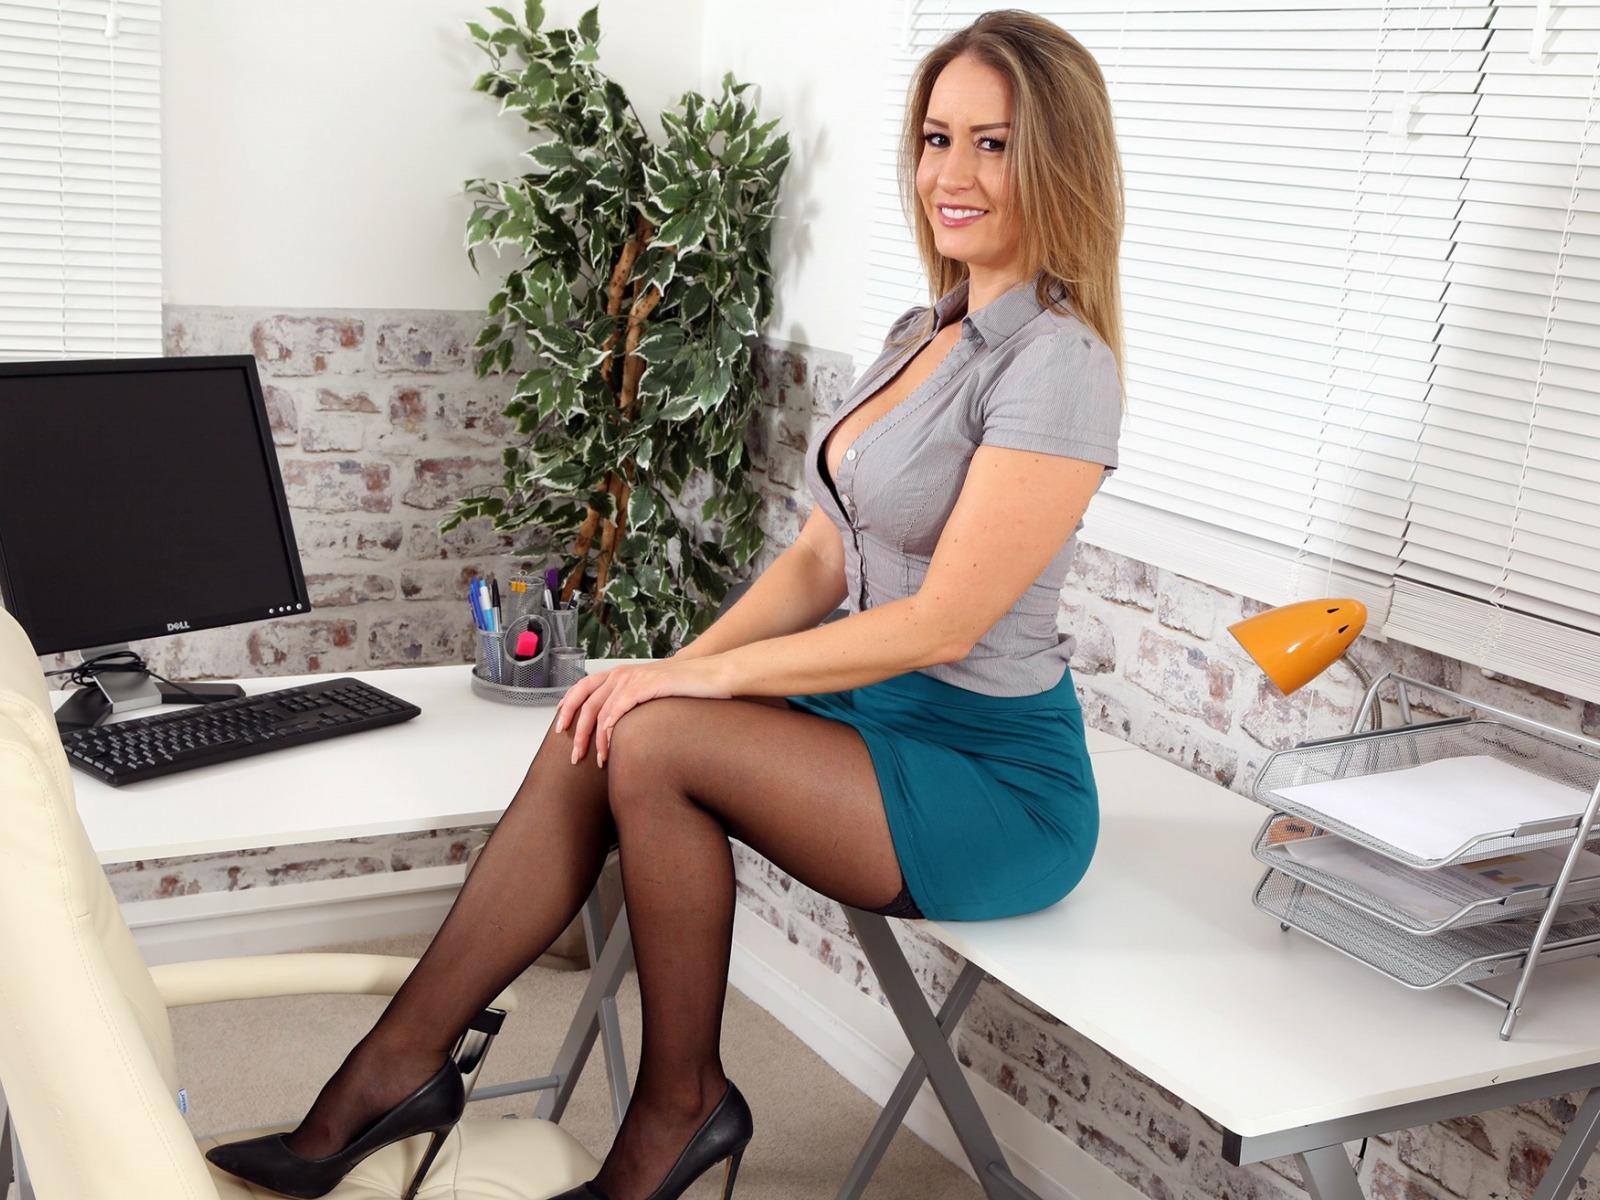 Фото секретарш в мини юбке, видео секс лесбиянки групповой секс